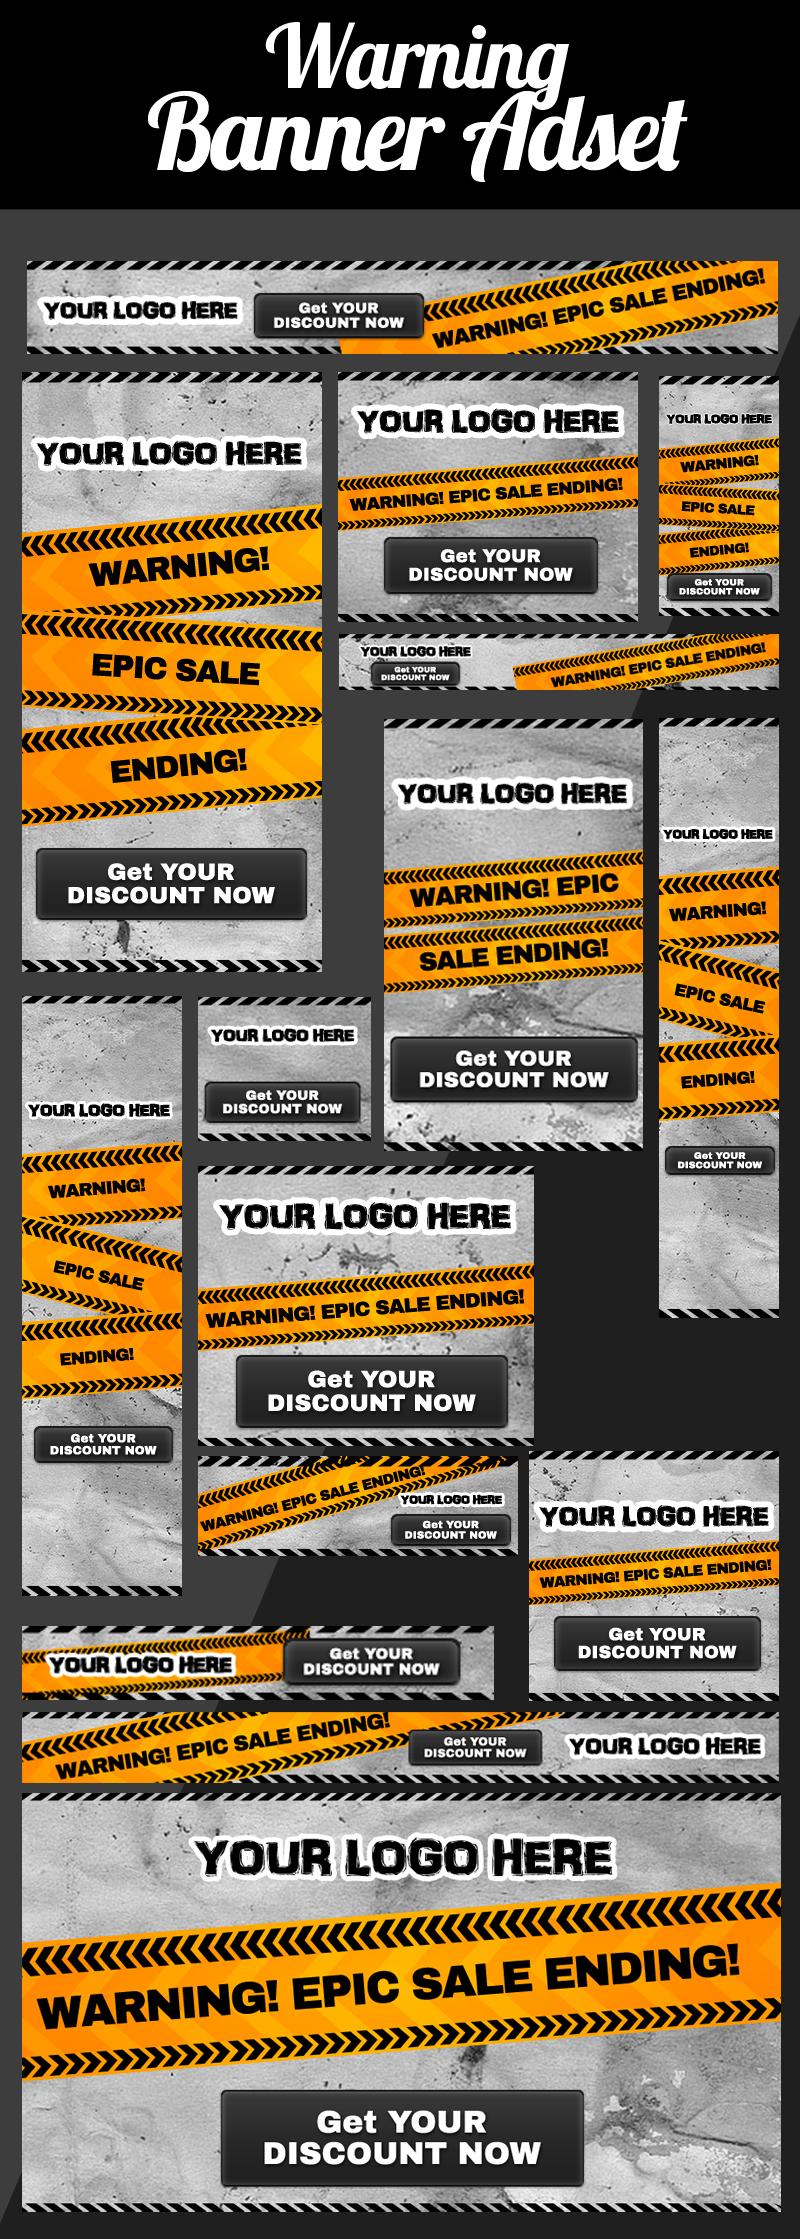 Warning Banner Adset